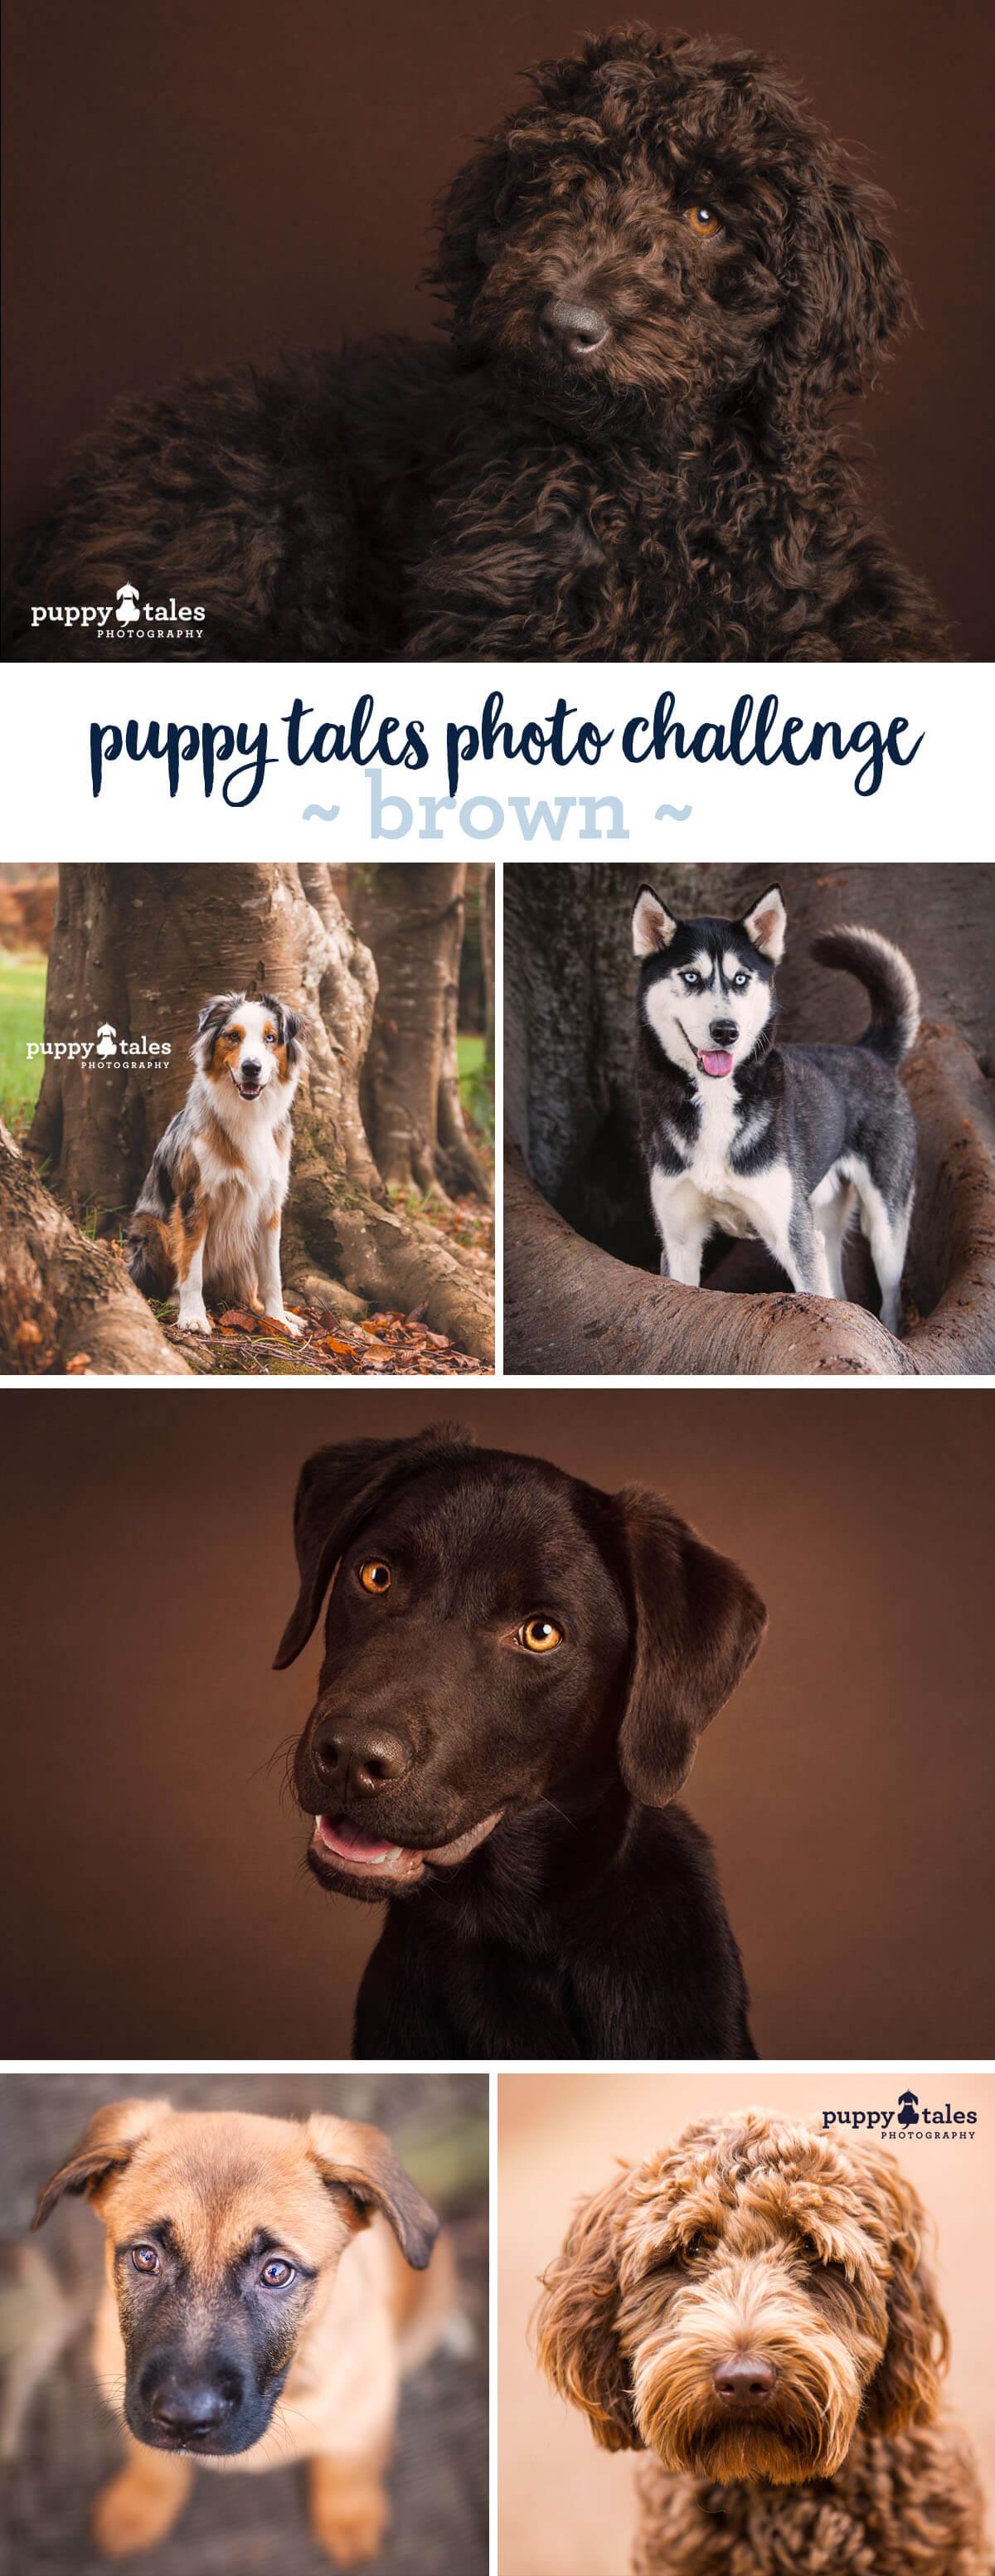 Puppy Tales Photo Challenge ~ Brown